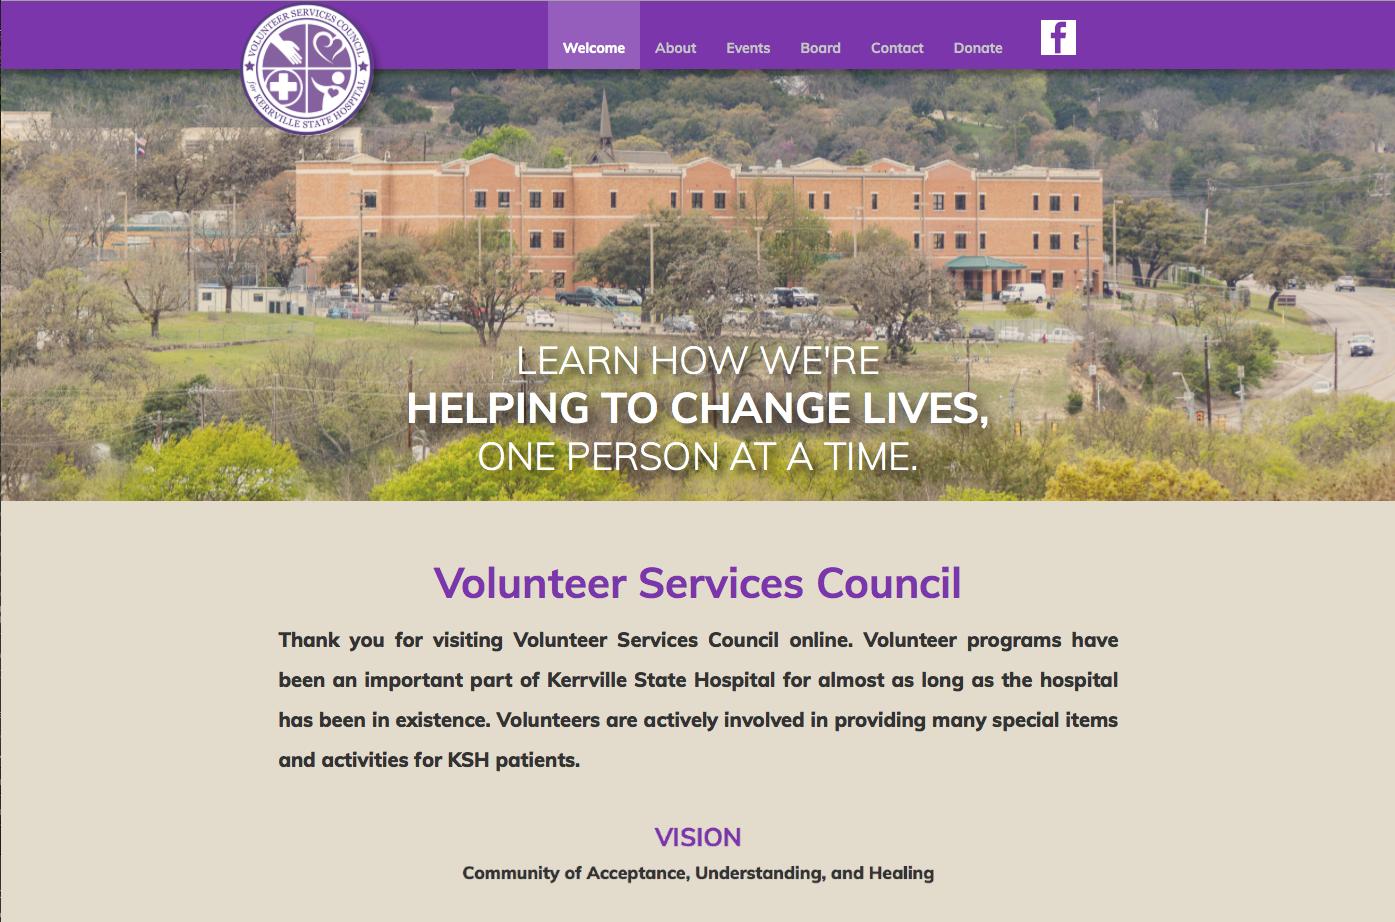 Volunteer Services Council